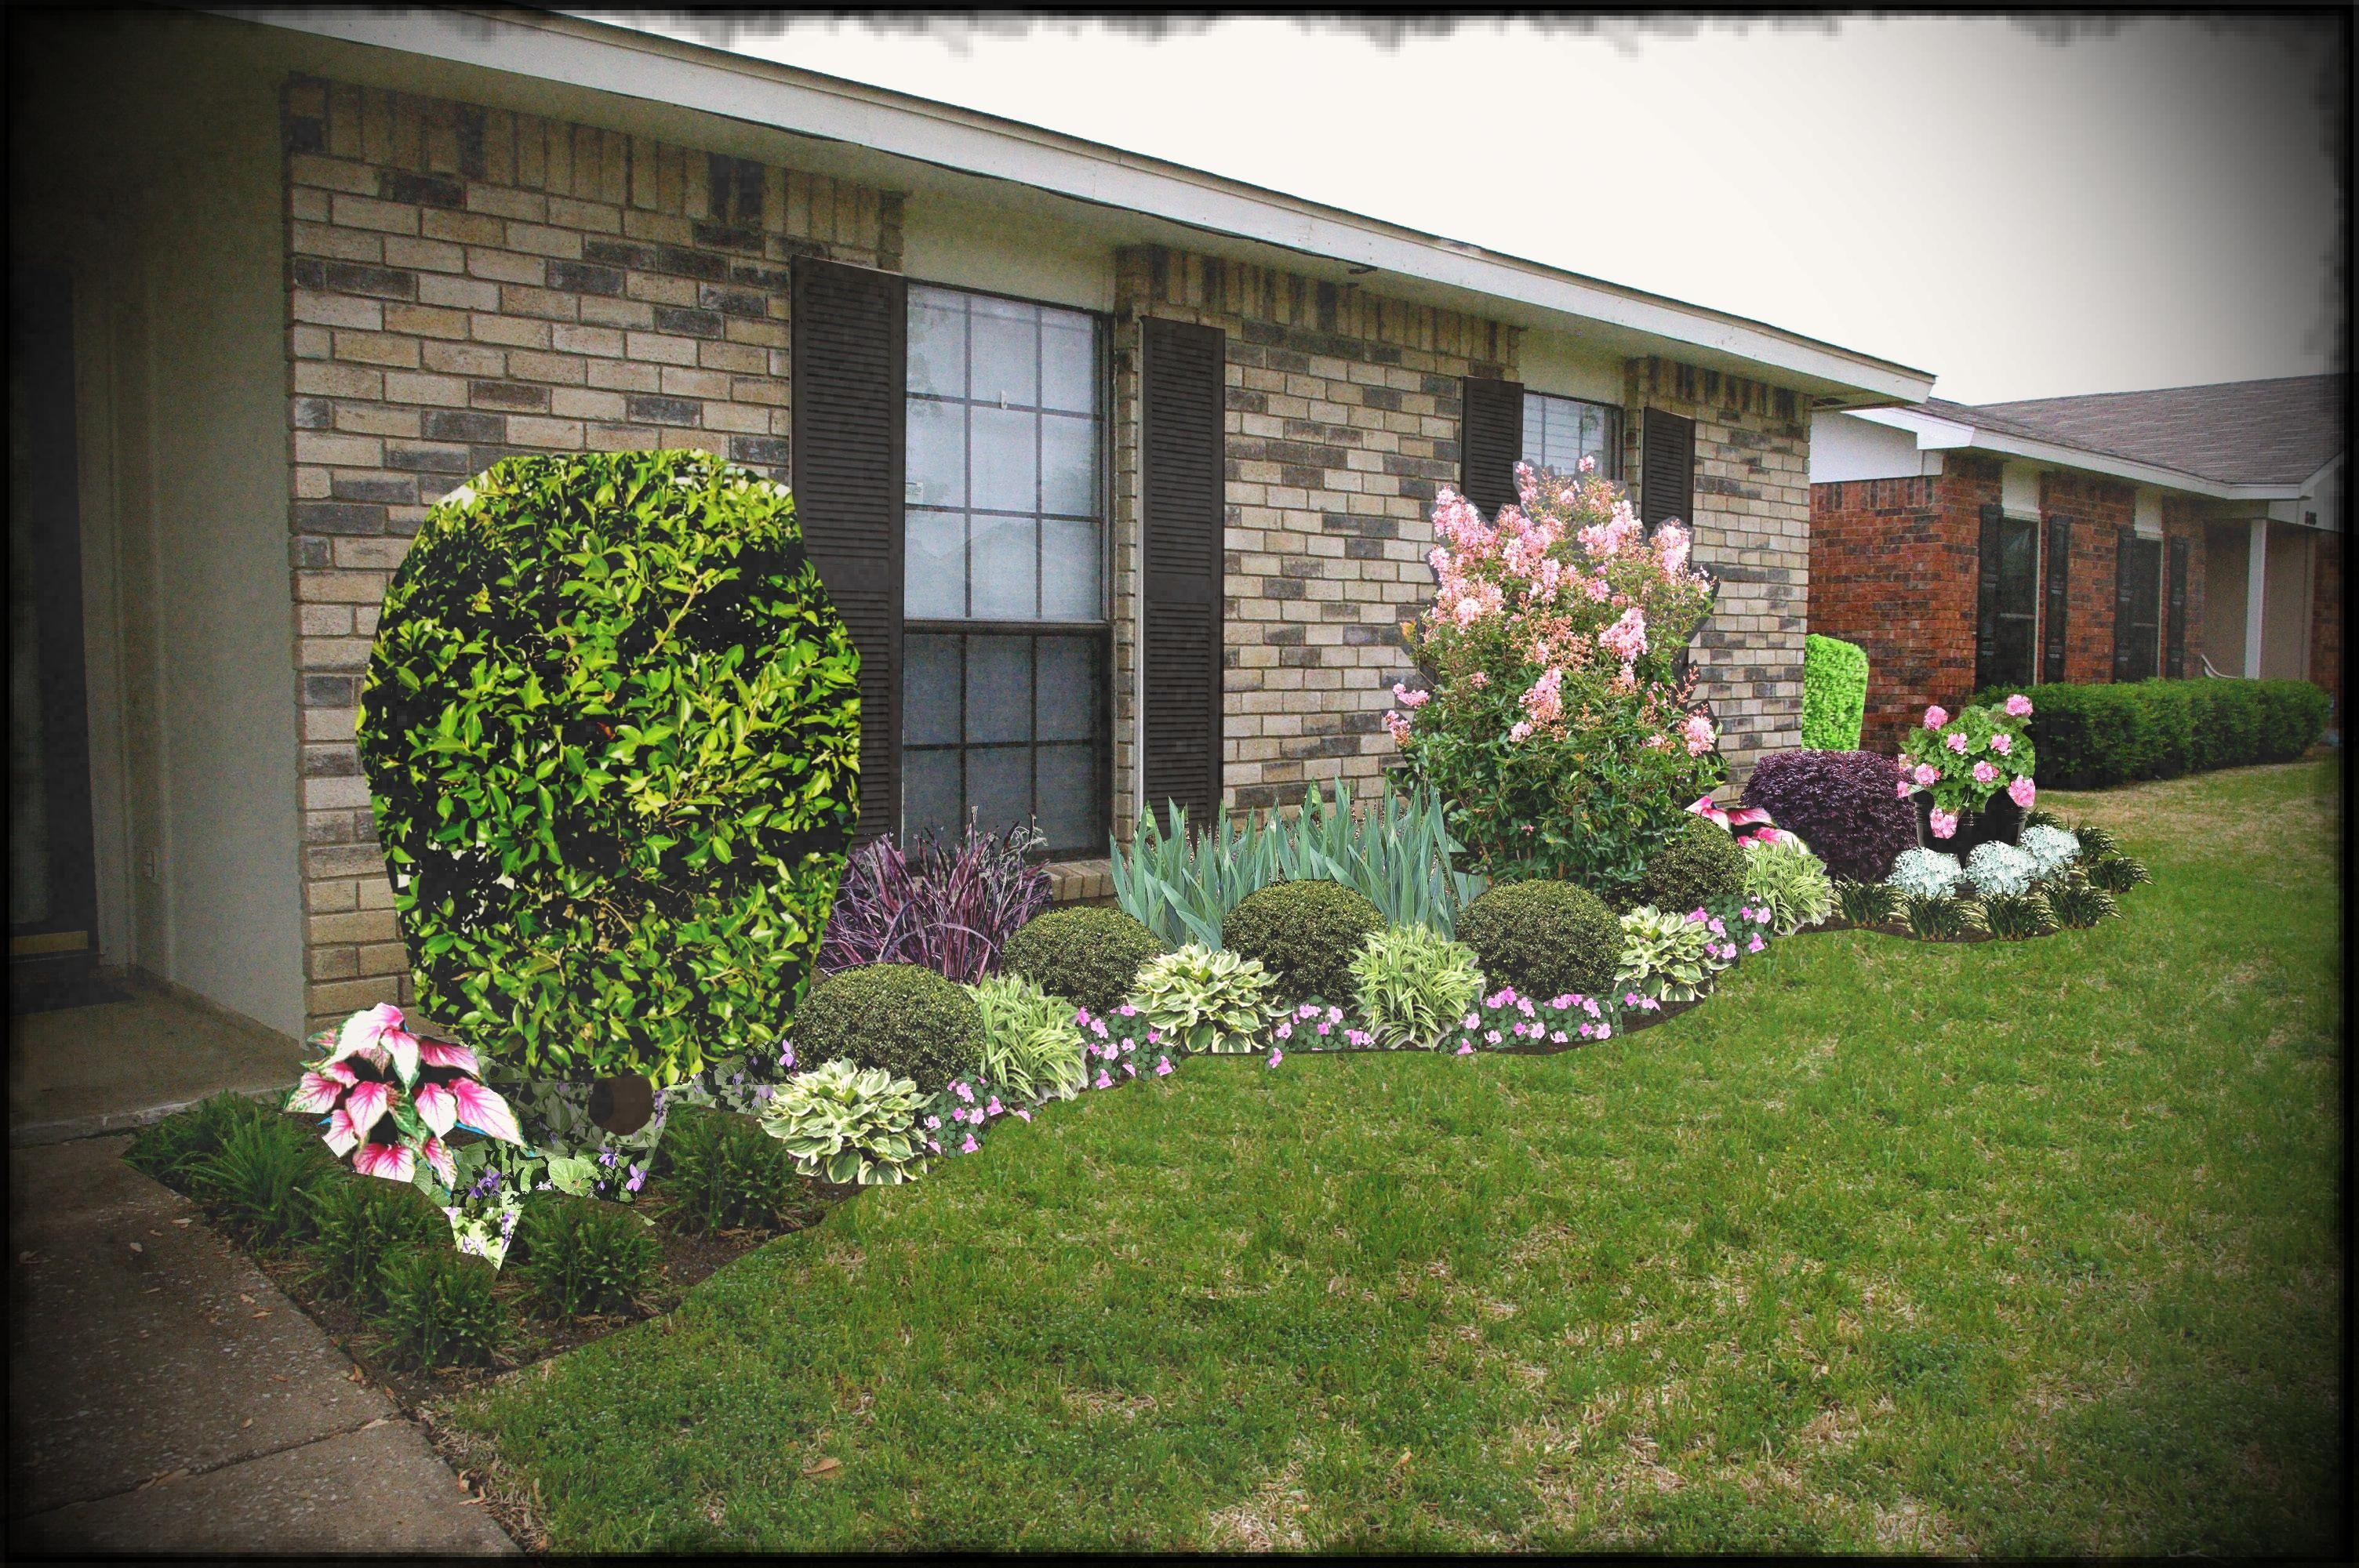 3e562c33e0028a9f29ddff34717e6584 - Better Homes And Gardens Landscape Design Software Free